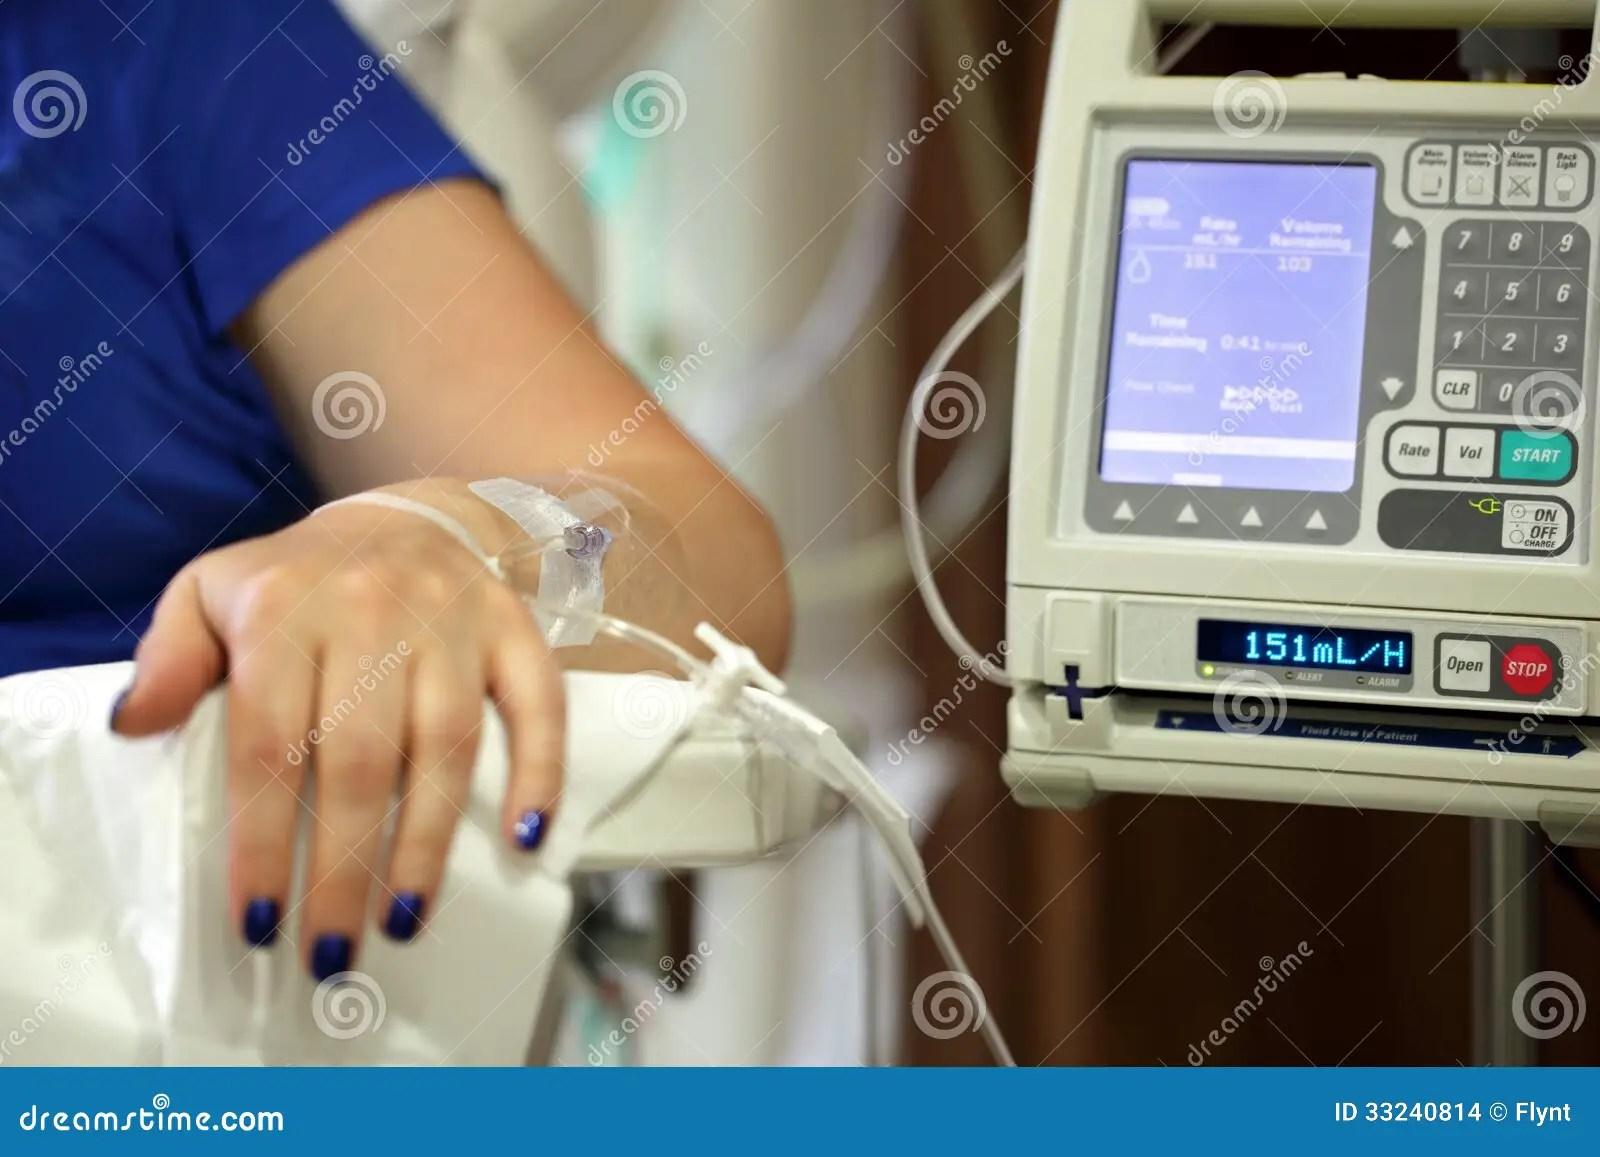 Intravenous IV Drip Stock Images  Image 33240814